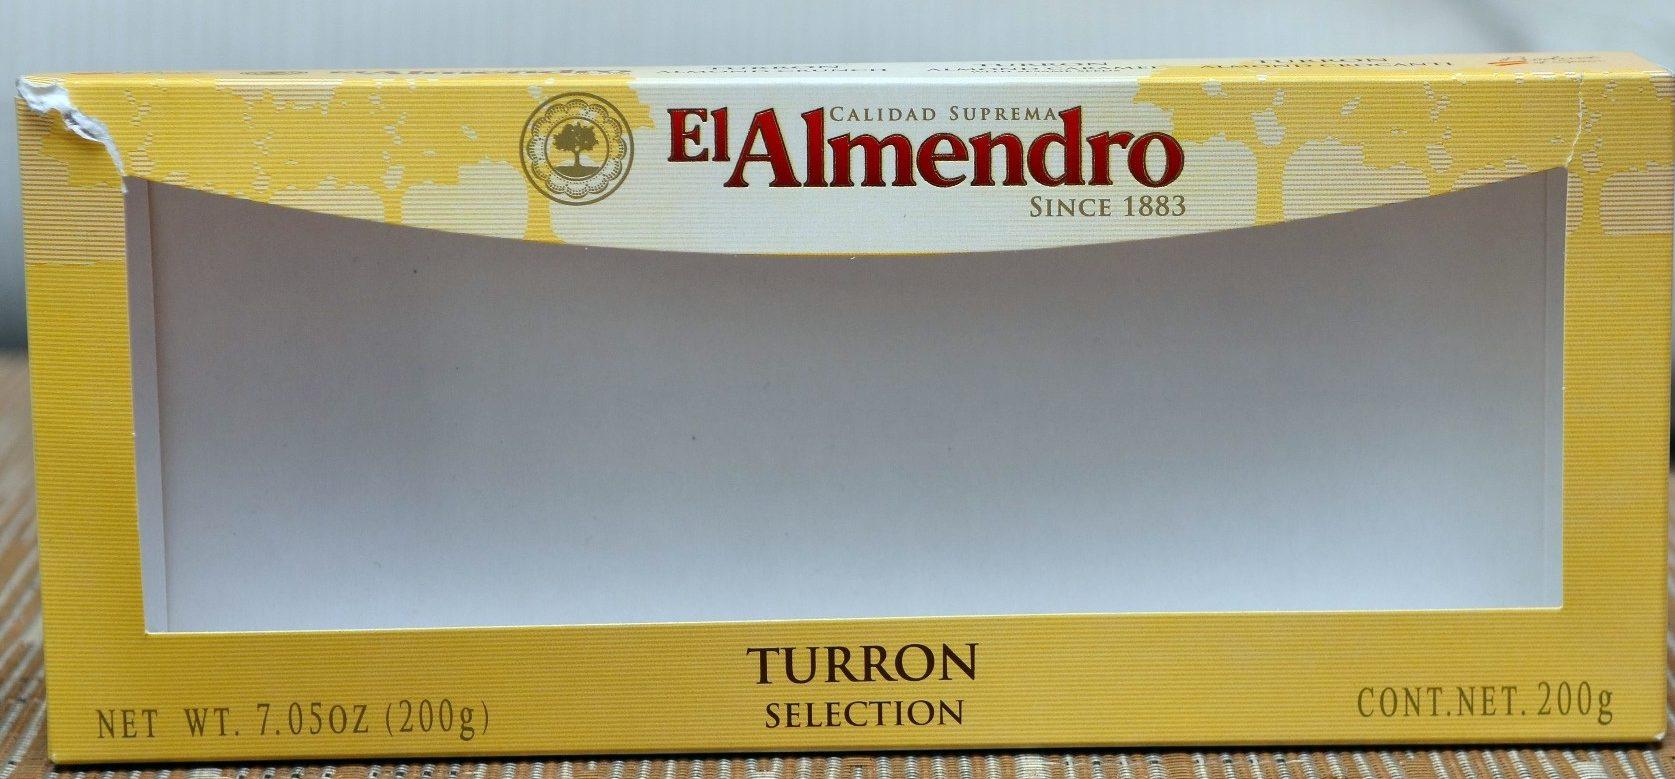 El Almendro Turron Selection - Product - es